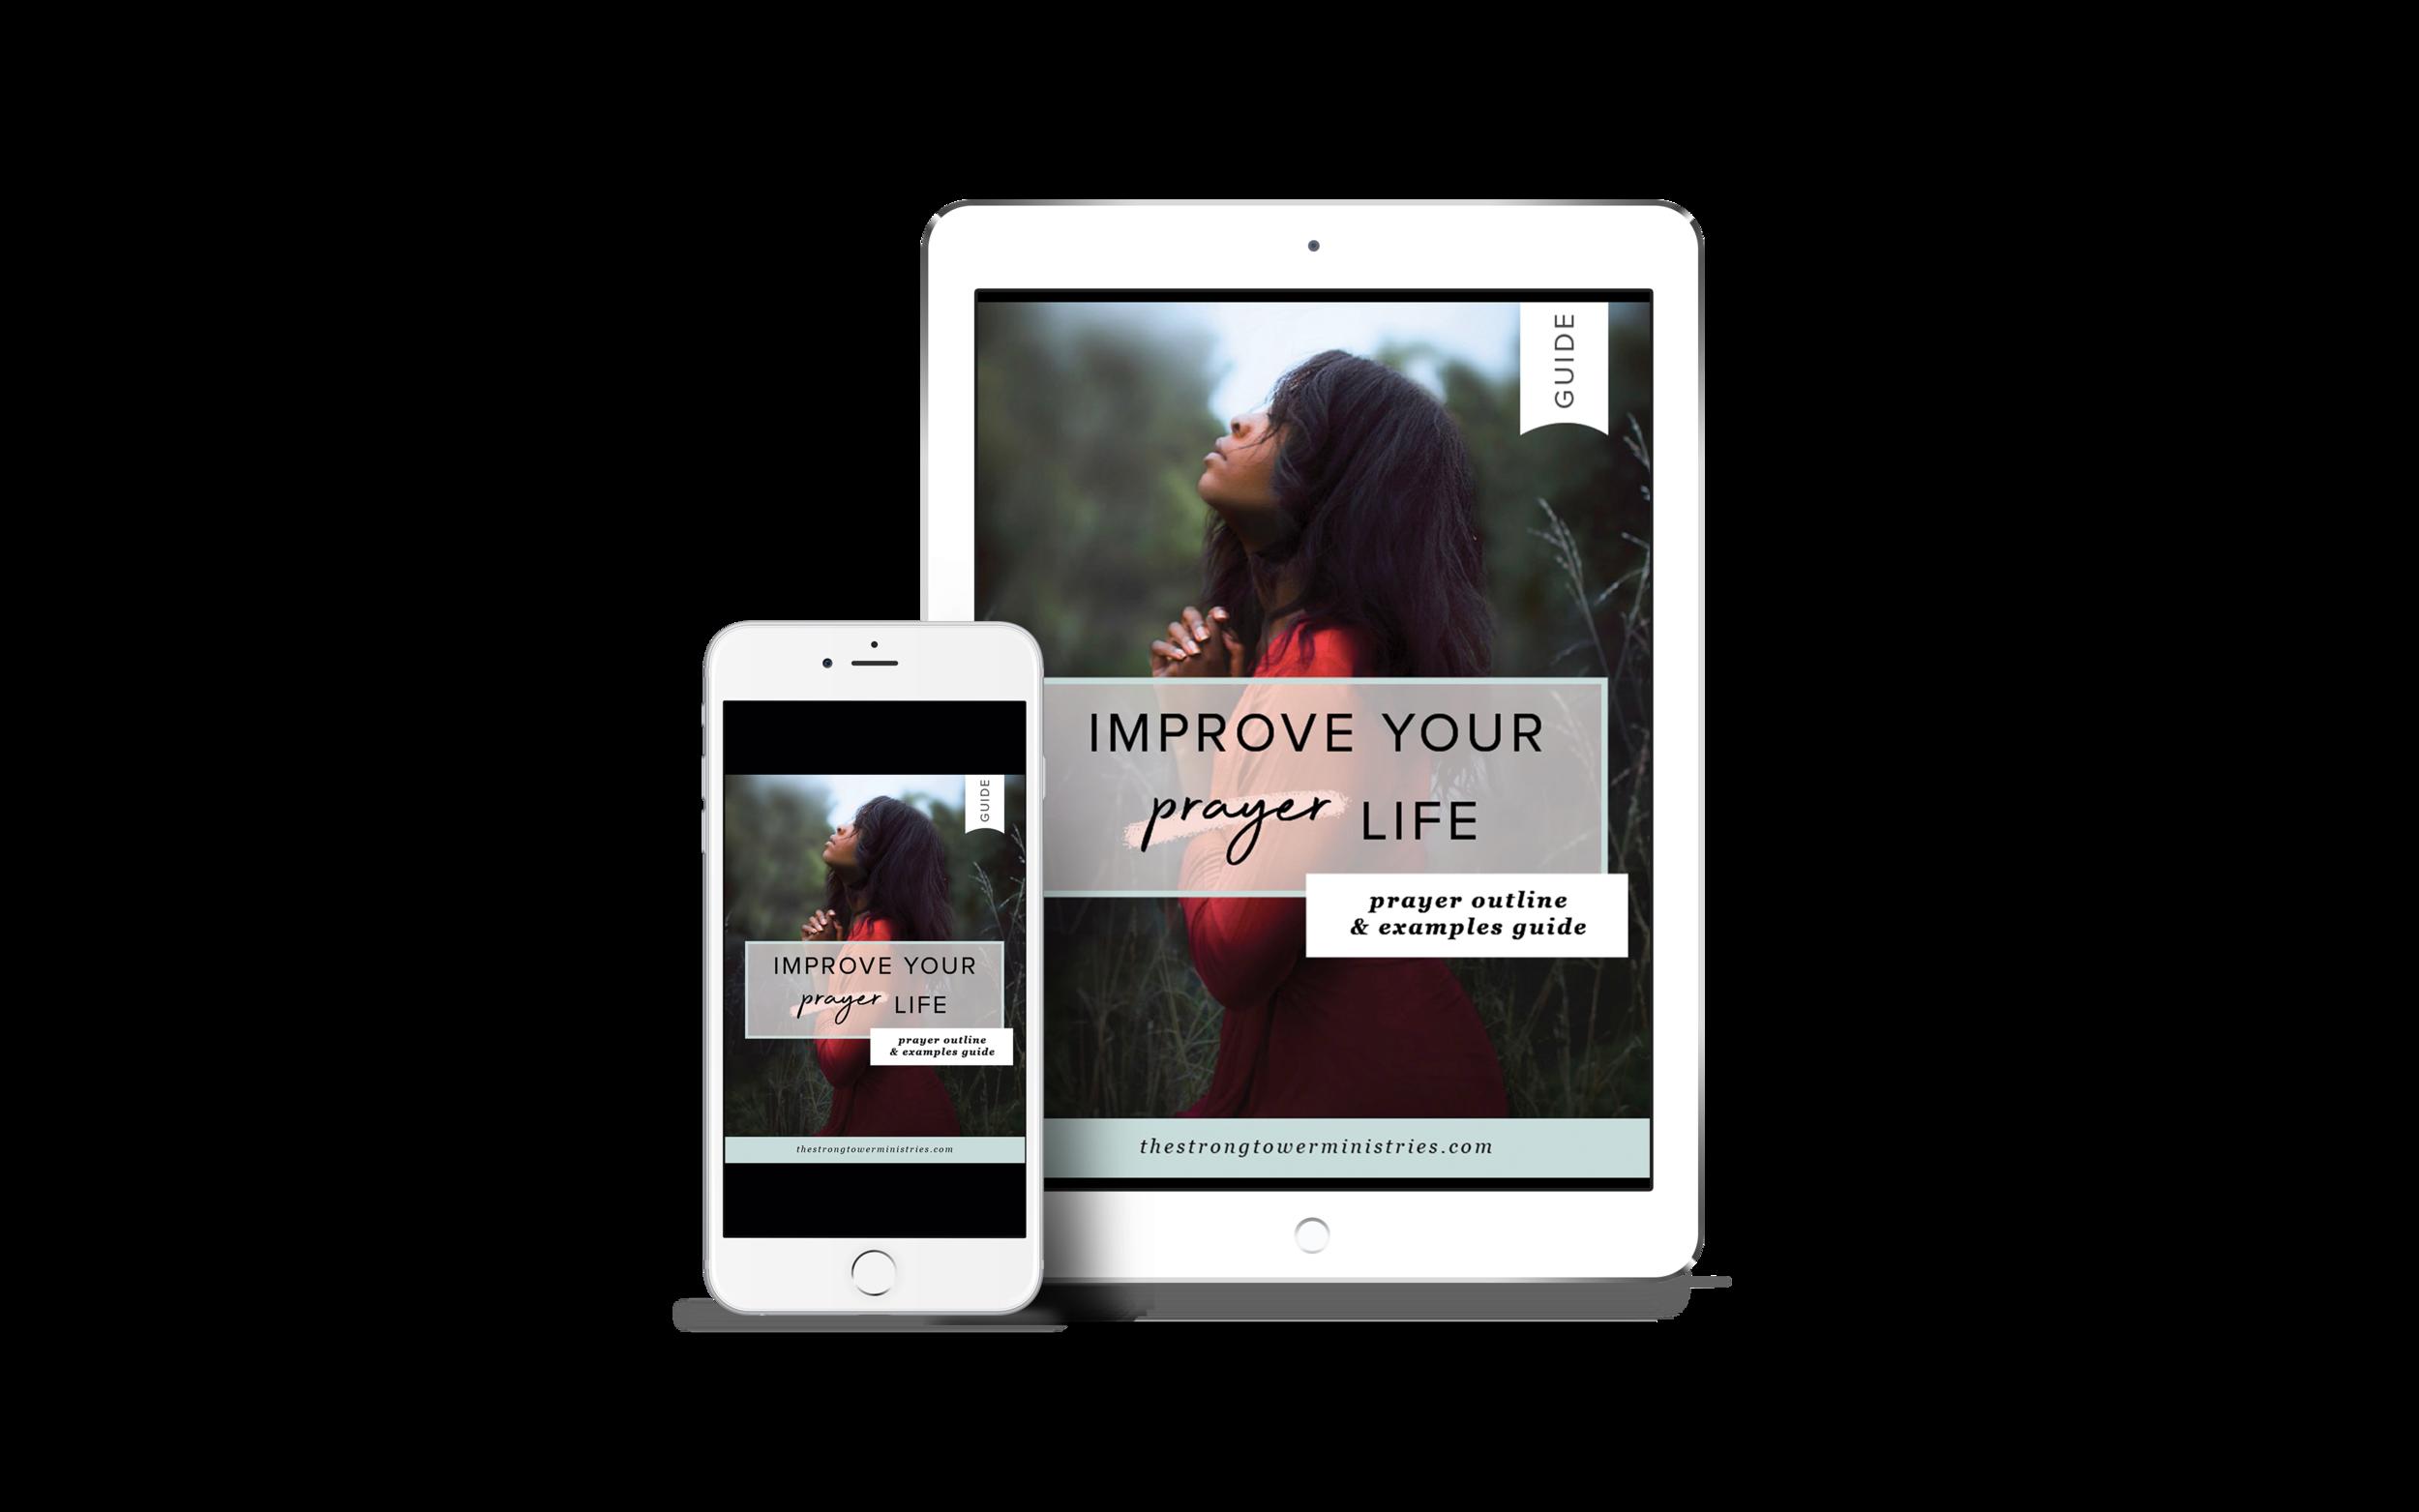 Improve-Your-Prayer-Life-Mockup.png